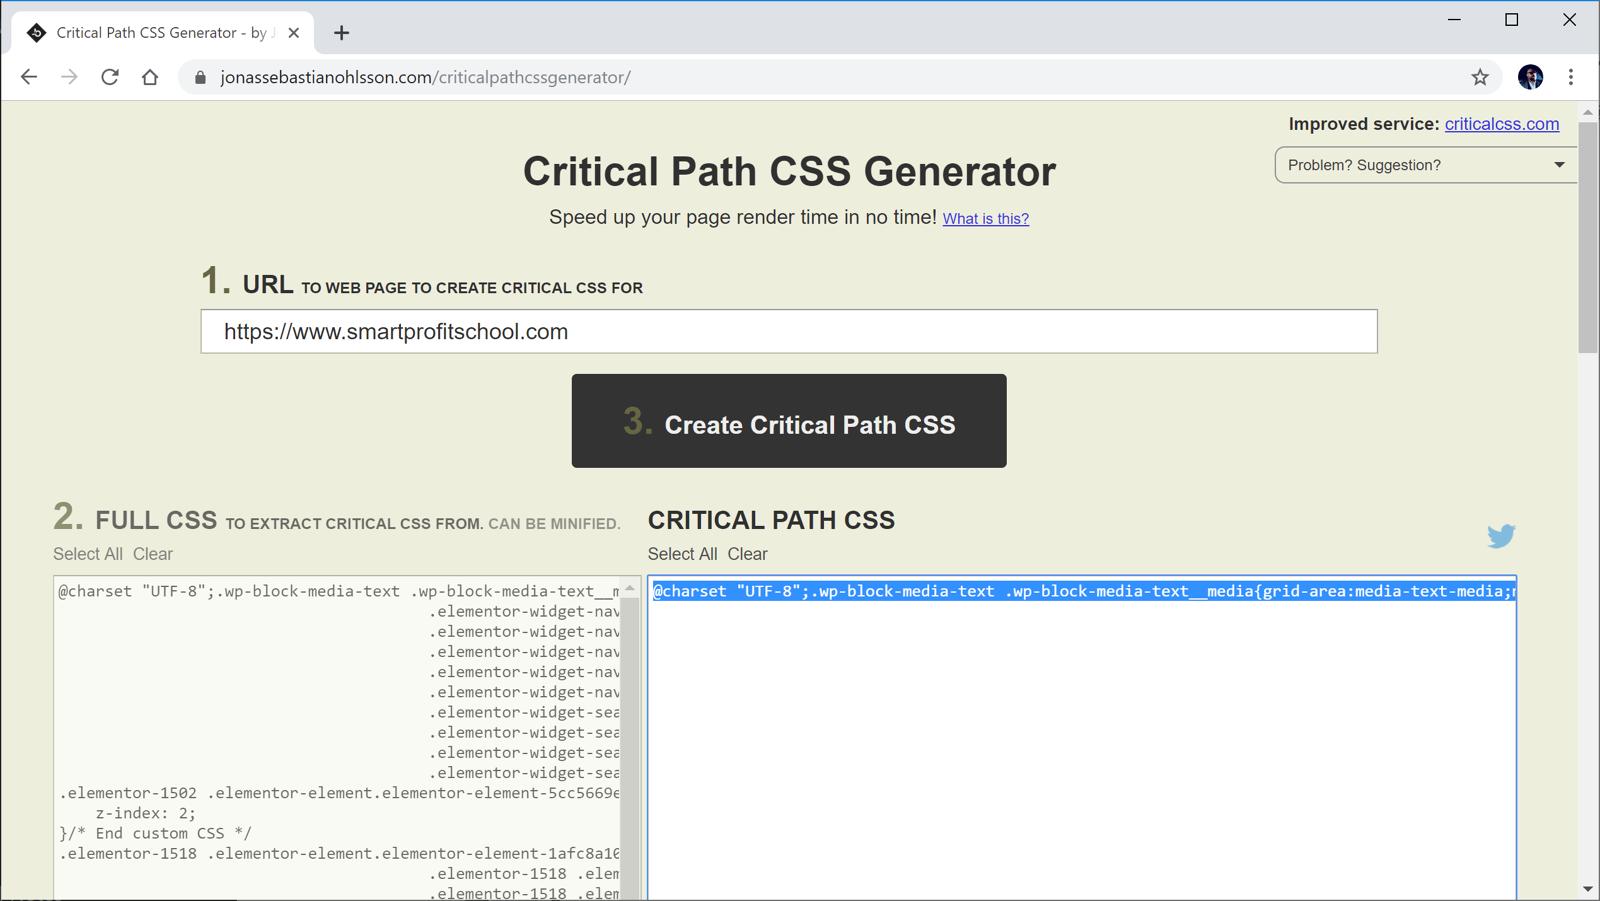 Critical Path CSS Generator - critical CSS